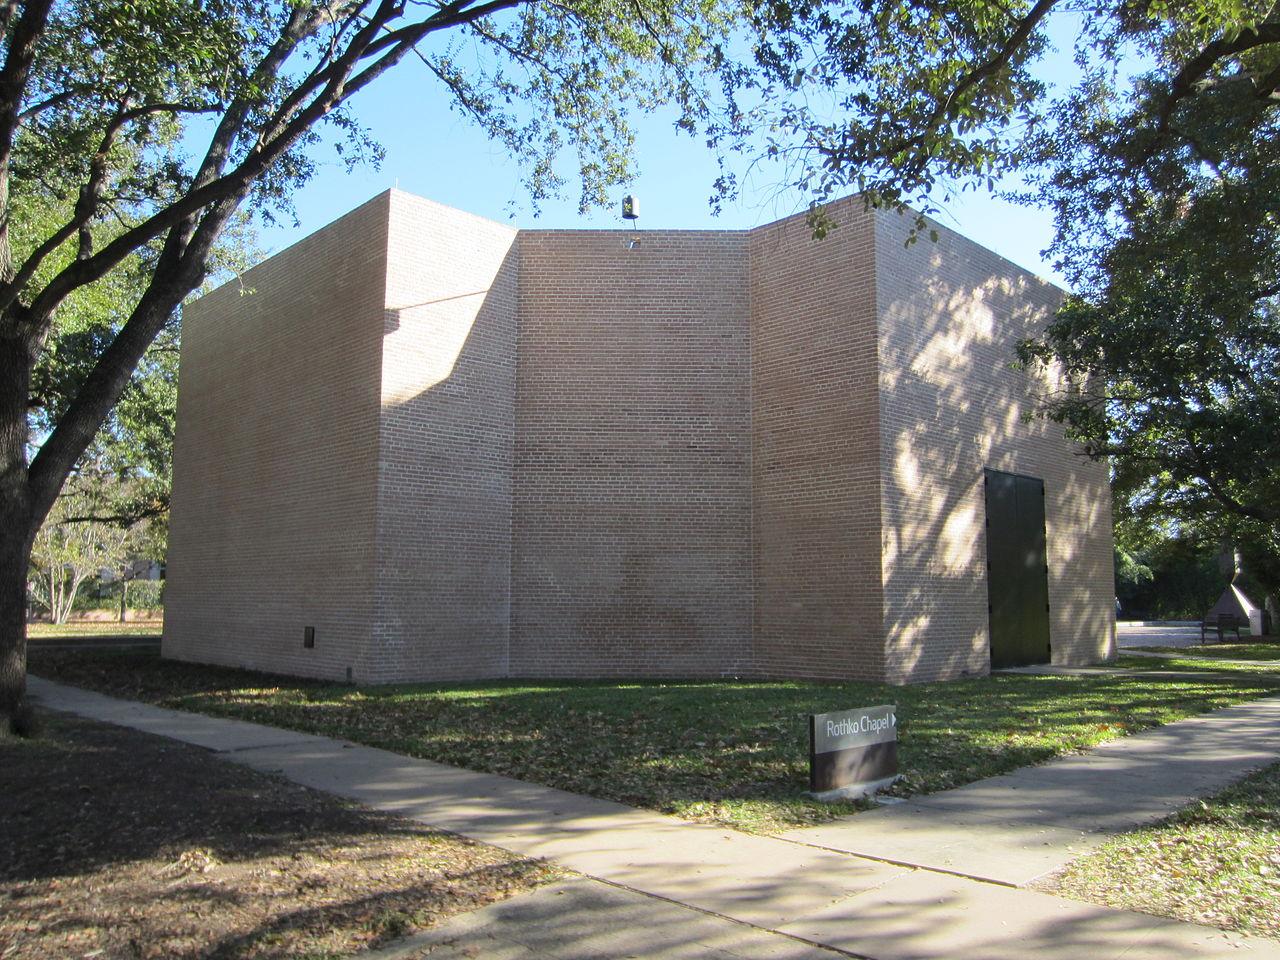 Rothko Chapel, Houston (by AnotheBeliever, CC)